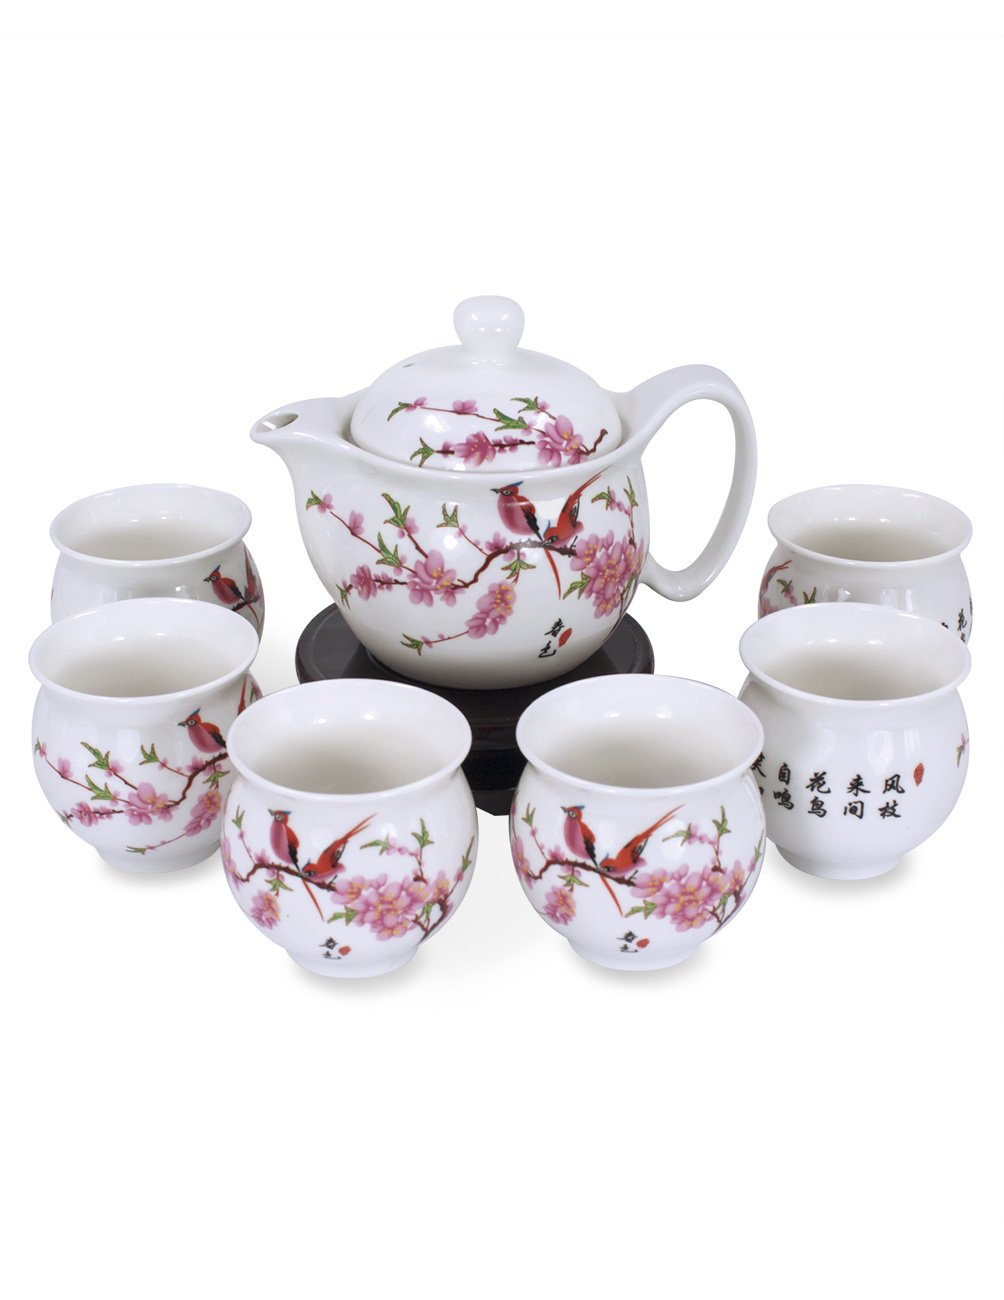 Dahlia Porcelain Peach Blossom Tea Set (Tea Pot w. Infuser + 6 Dual Layer Tea Cups) in Gift Box